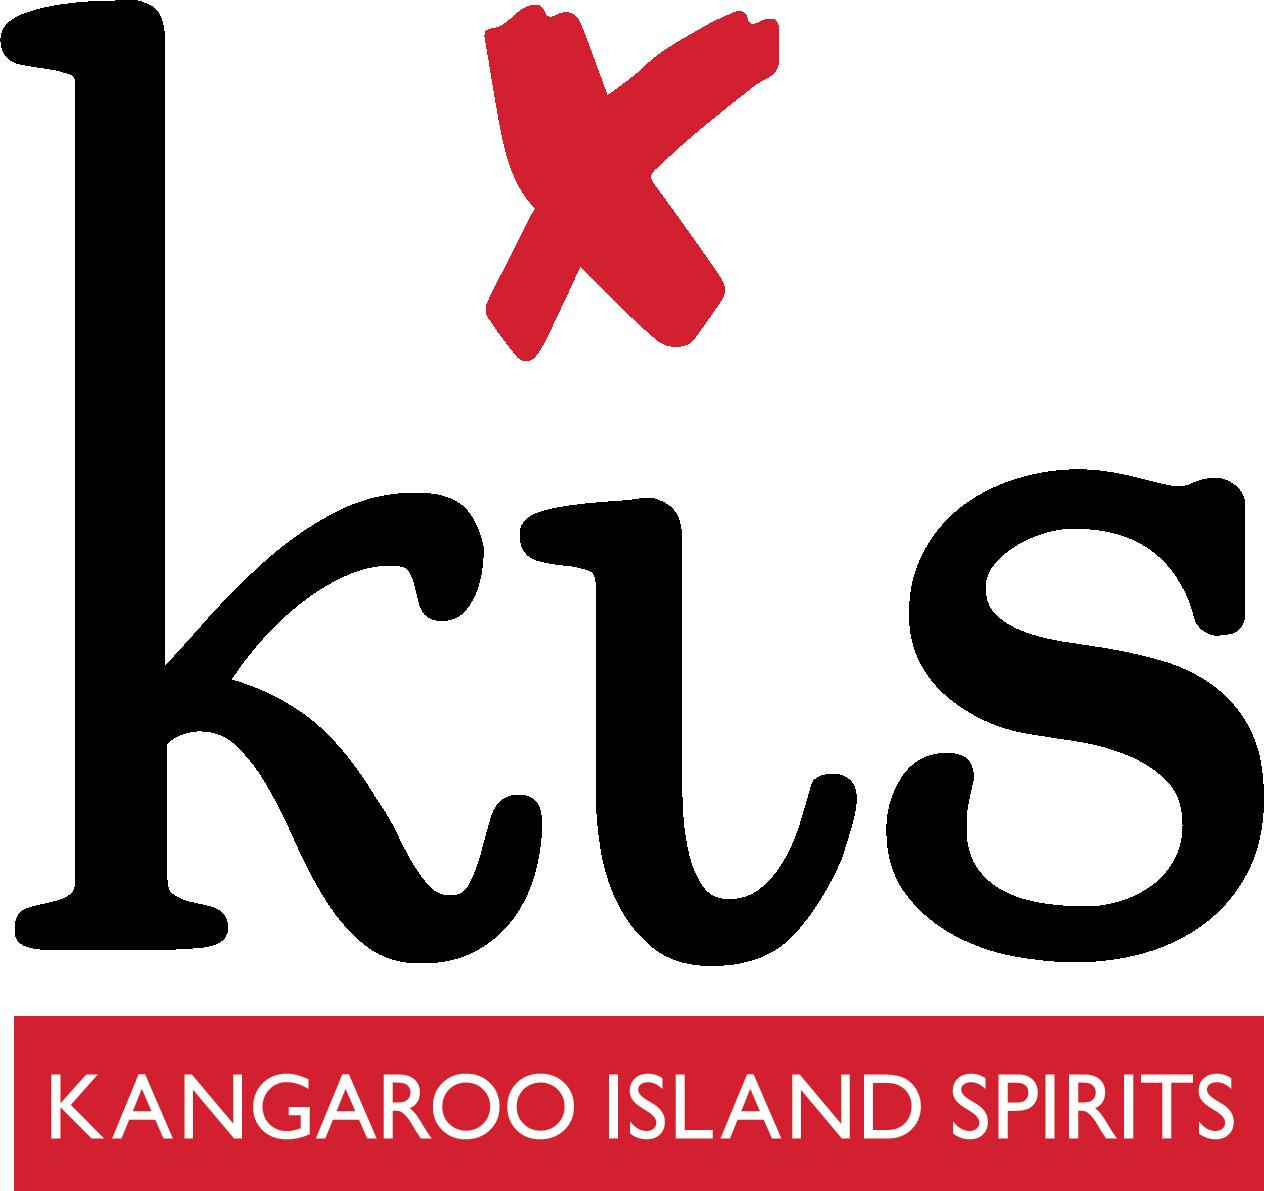 Kangaroo Island Spirits